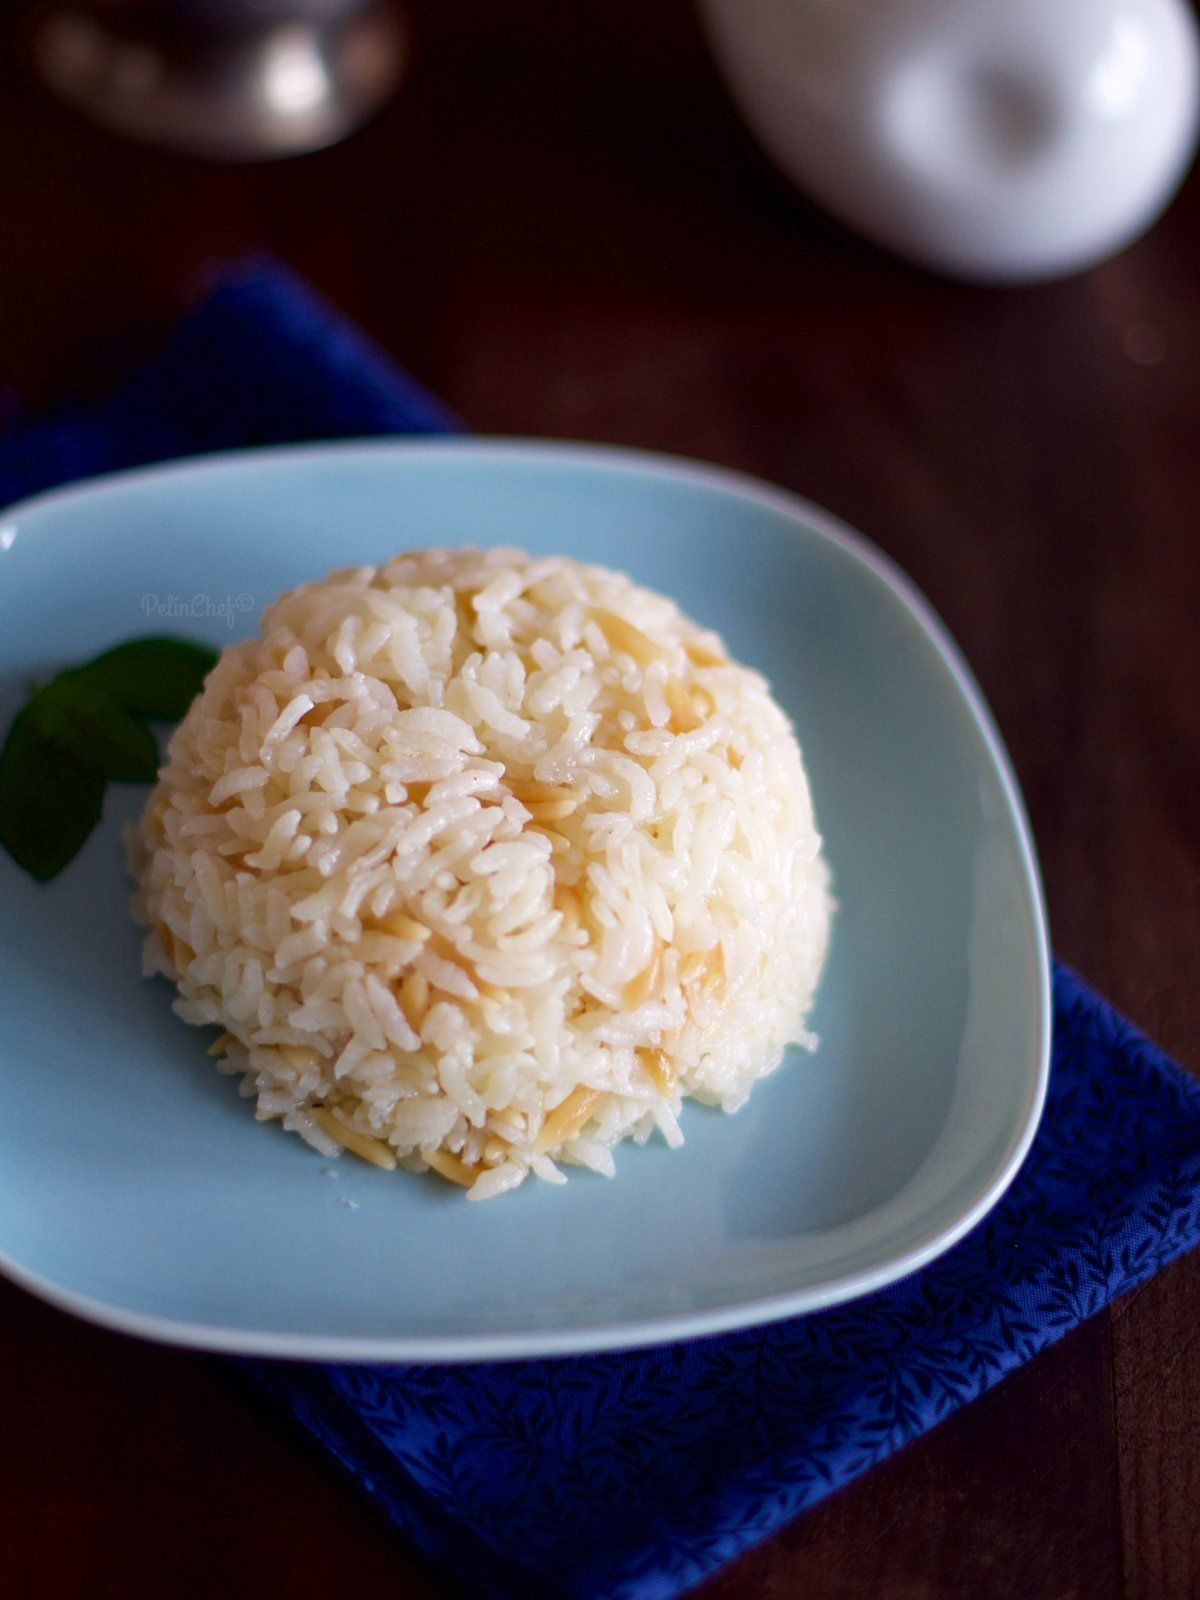 ehriyeli Pirinç Pilavı